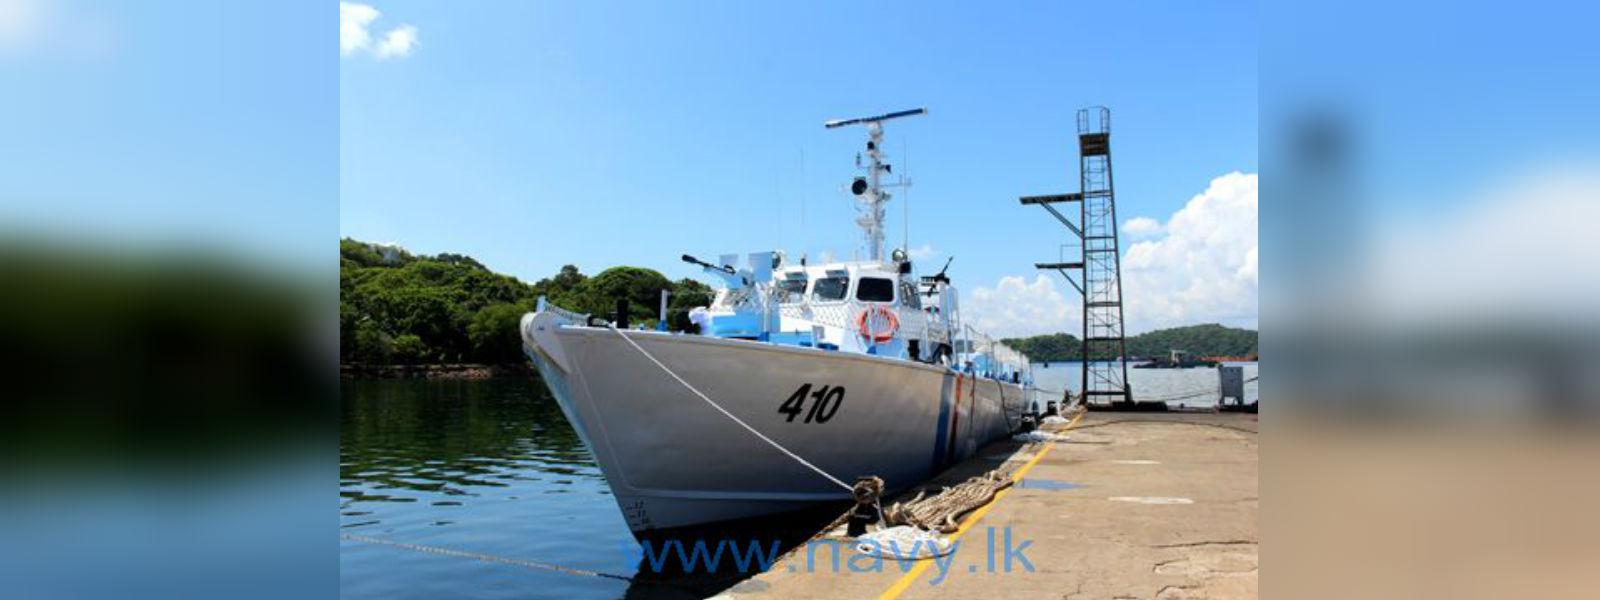 CG 410 handed over to the Sri Lanka Coast Guard